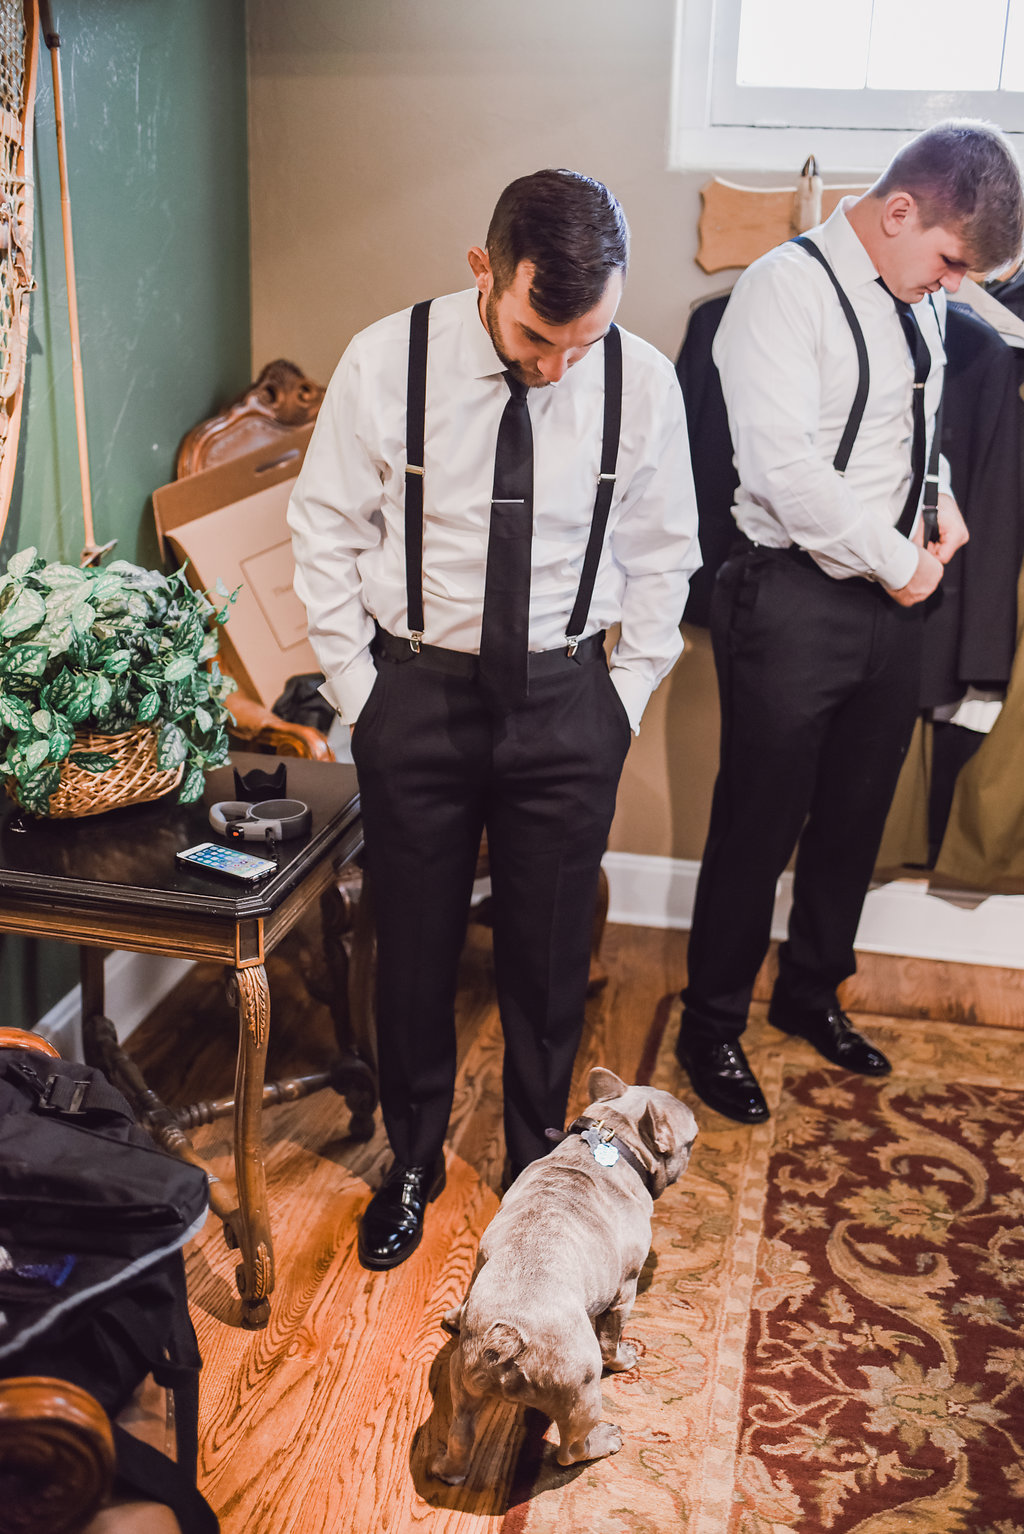 groom getting ready at Lionsgate Event Center, Colorado Wedding Photographer, Denver Wedding Photographer, Downtown Denver Wedding Photographer, Colorado Elopement Photographer, Denver Elopement Photographer, Rocky Mountain Wedding Photographer,